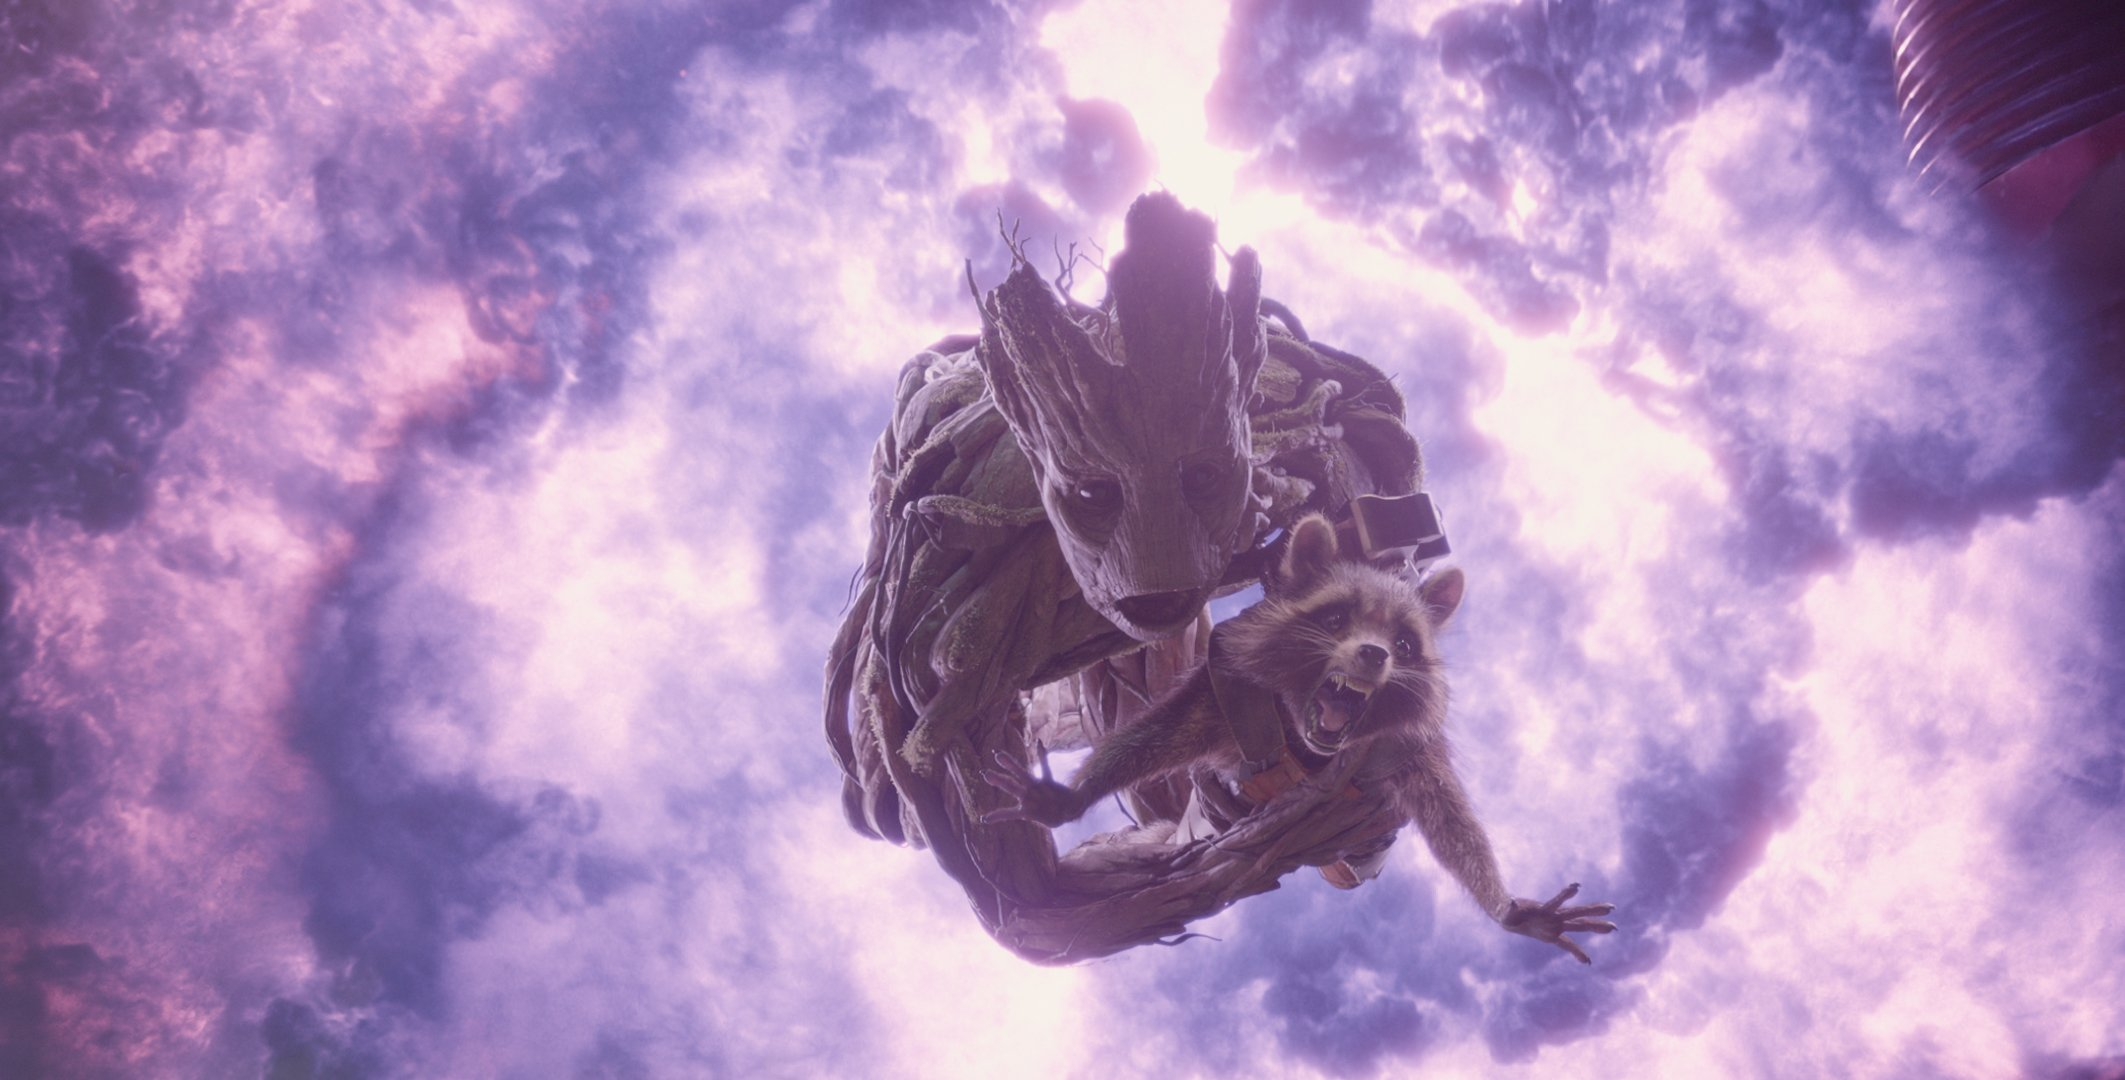 groot-rocket-guardians-of-the-galaxy_1.jpg